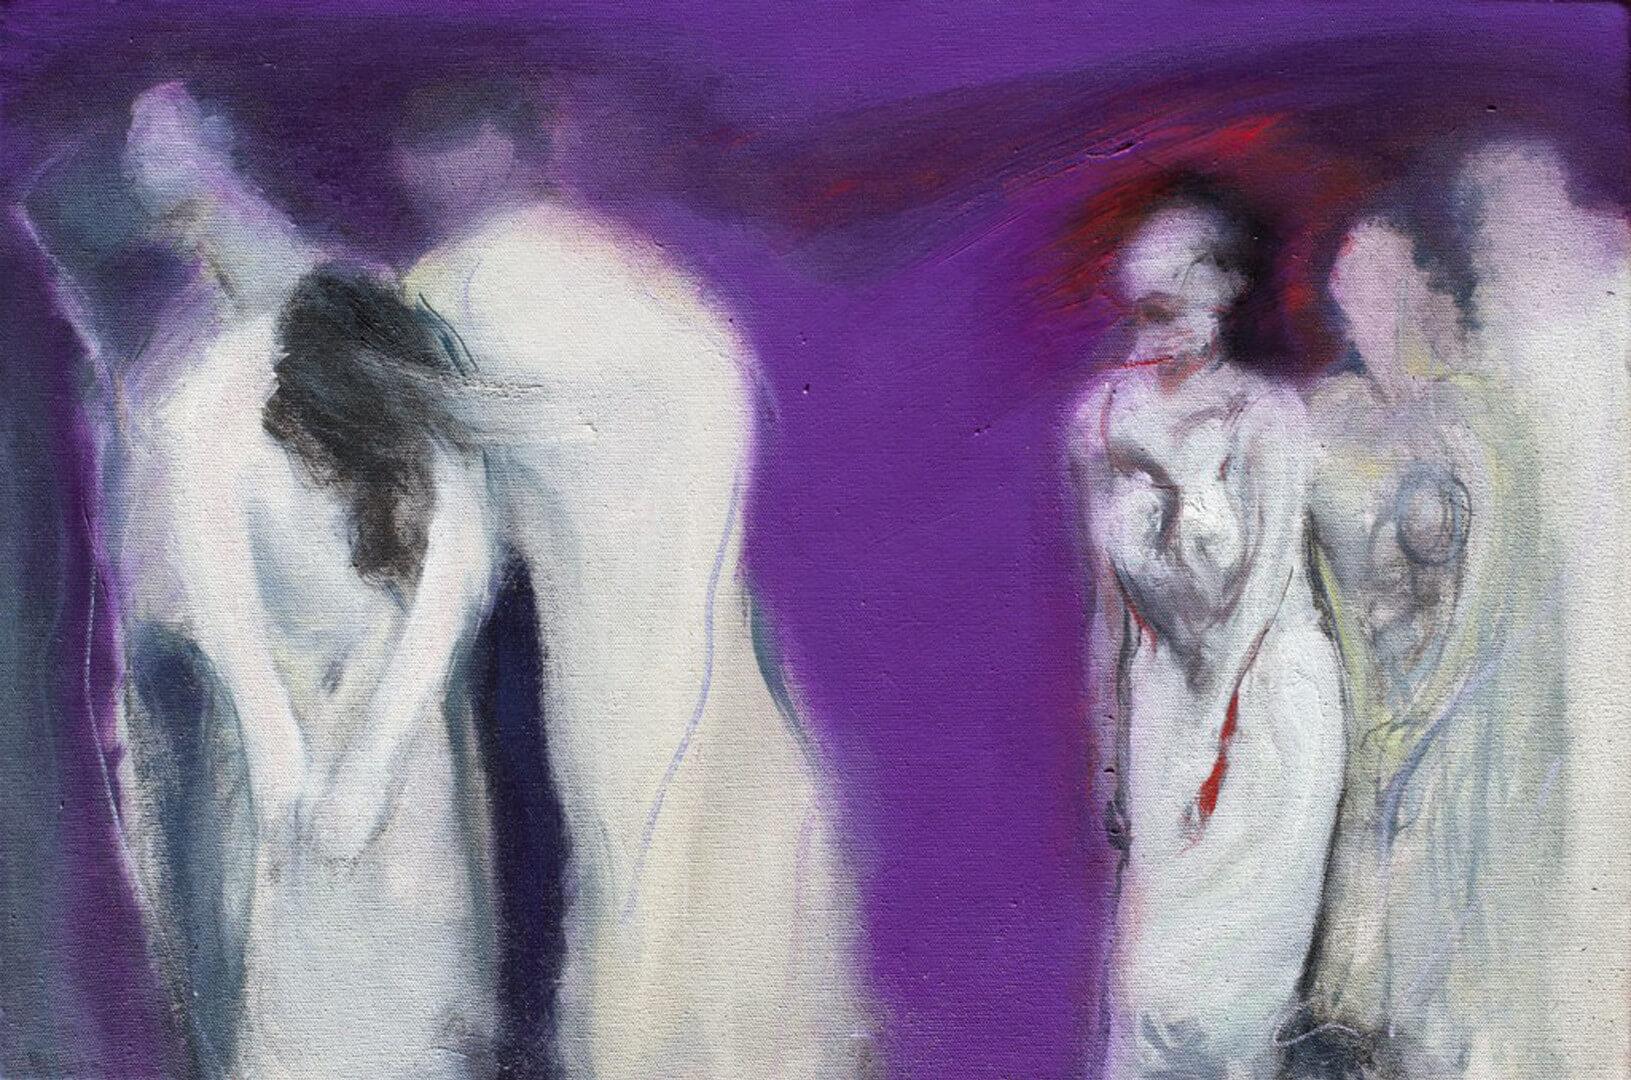 2011 - Oil on canvas. 50 cm. x 60 cm.